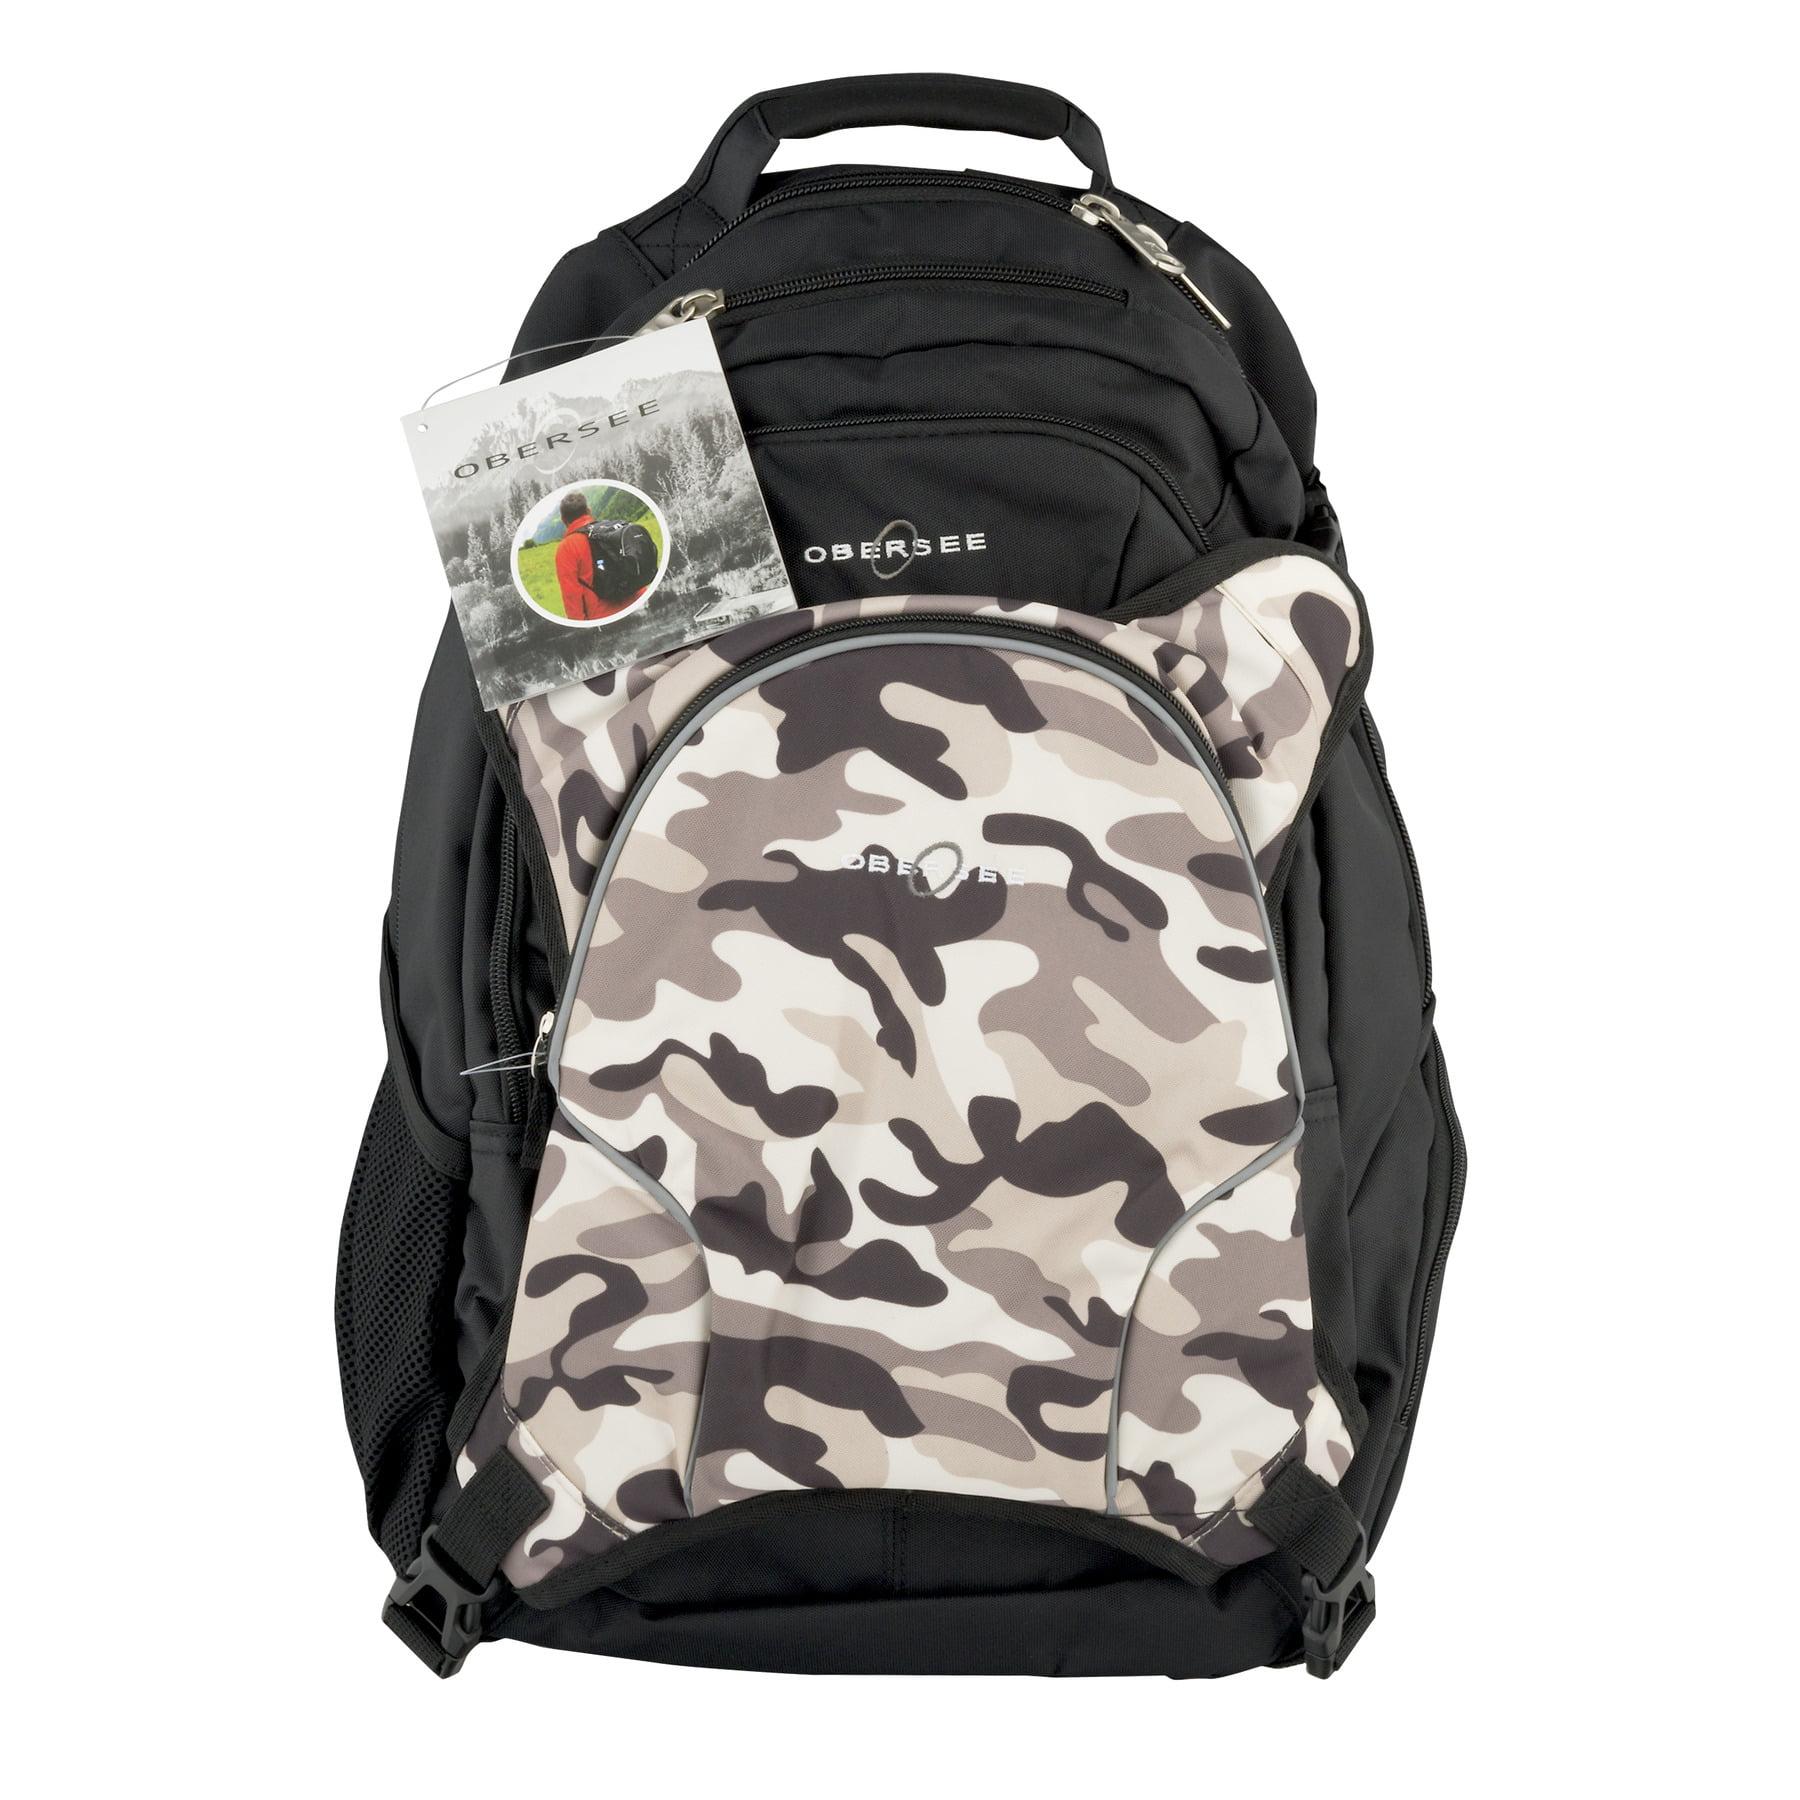 Obersee Bern Diaper Bag Backpack and Cooler, Black/Camo